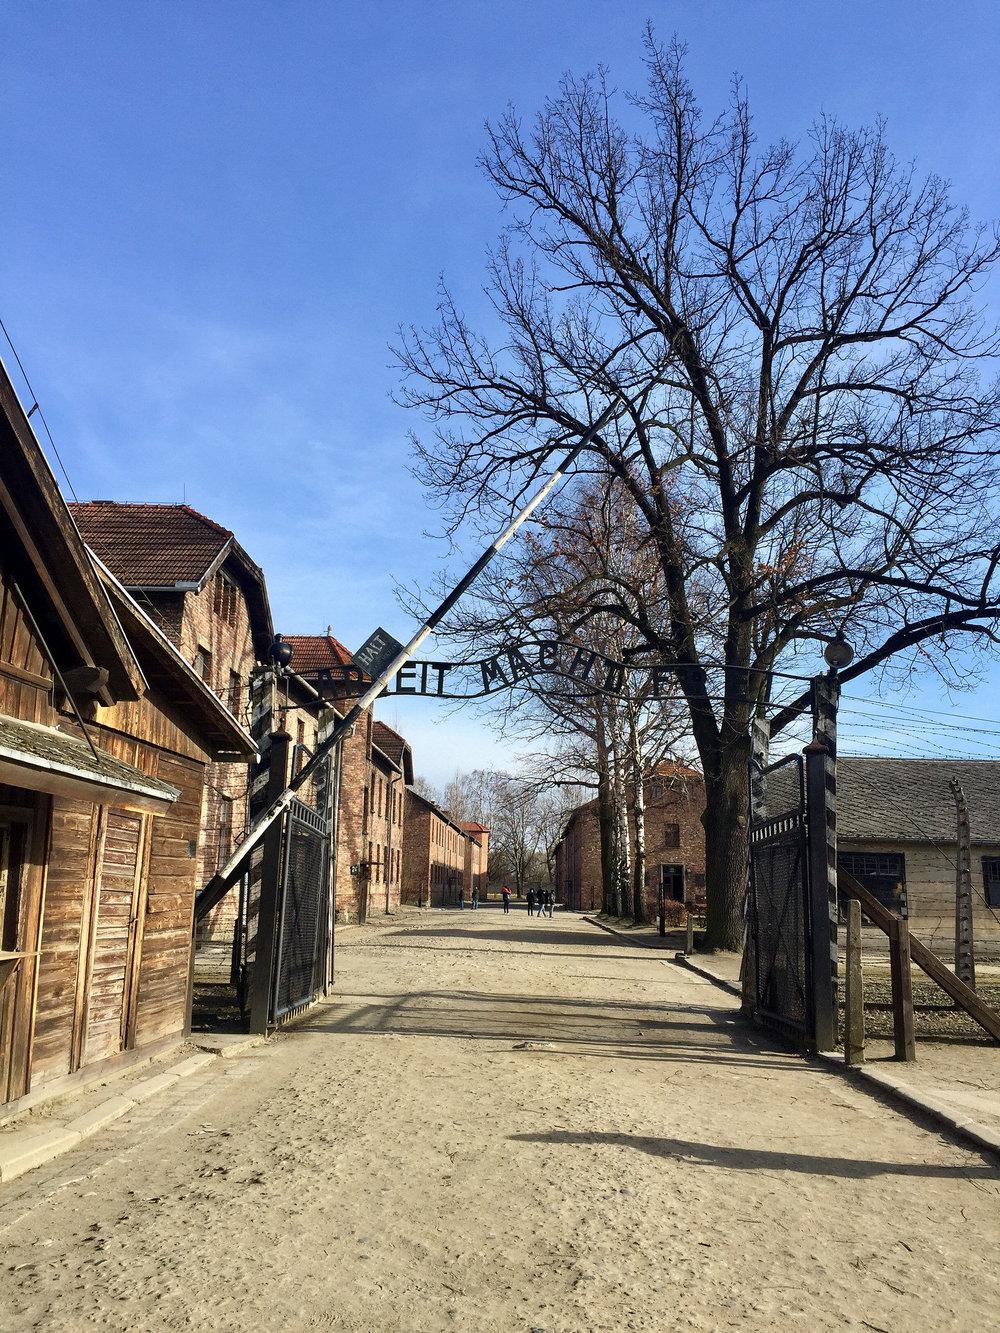 Auschwitz I.Arbeit macht frei: Work sets you free.